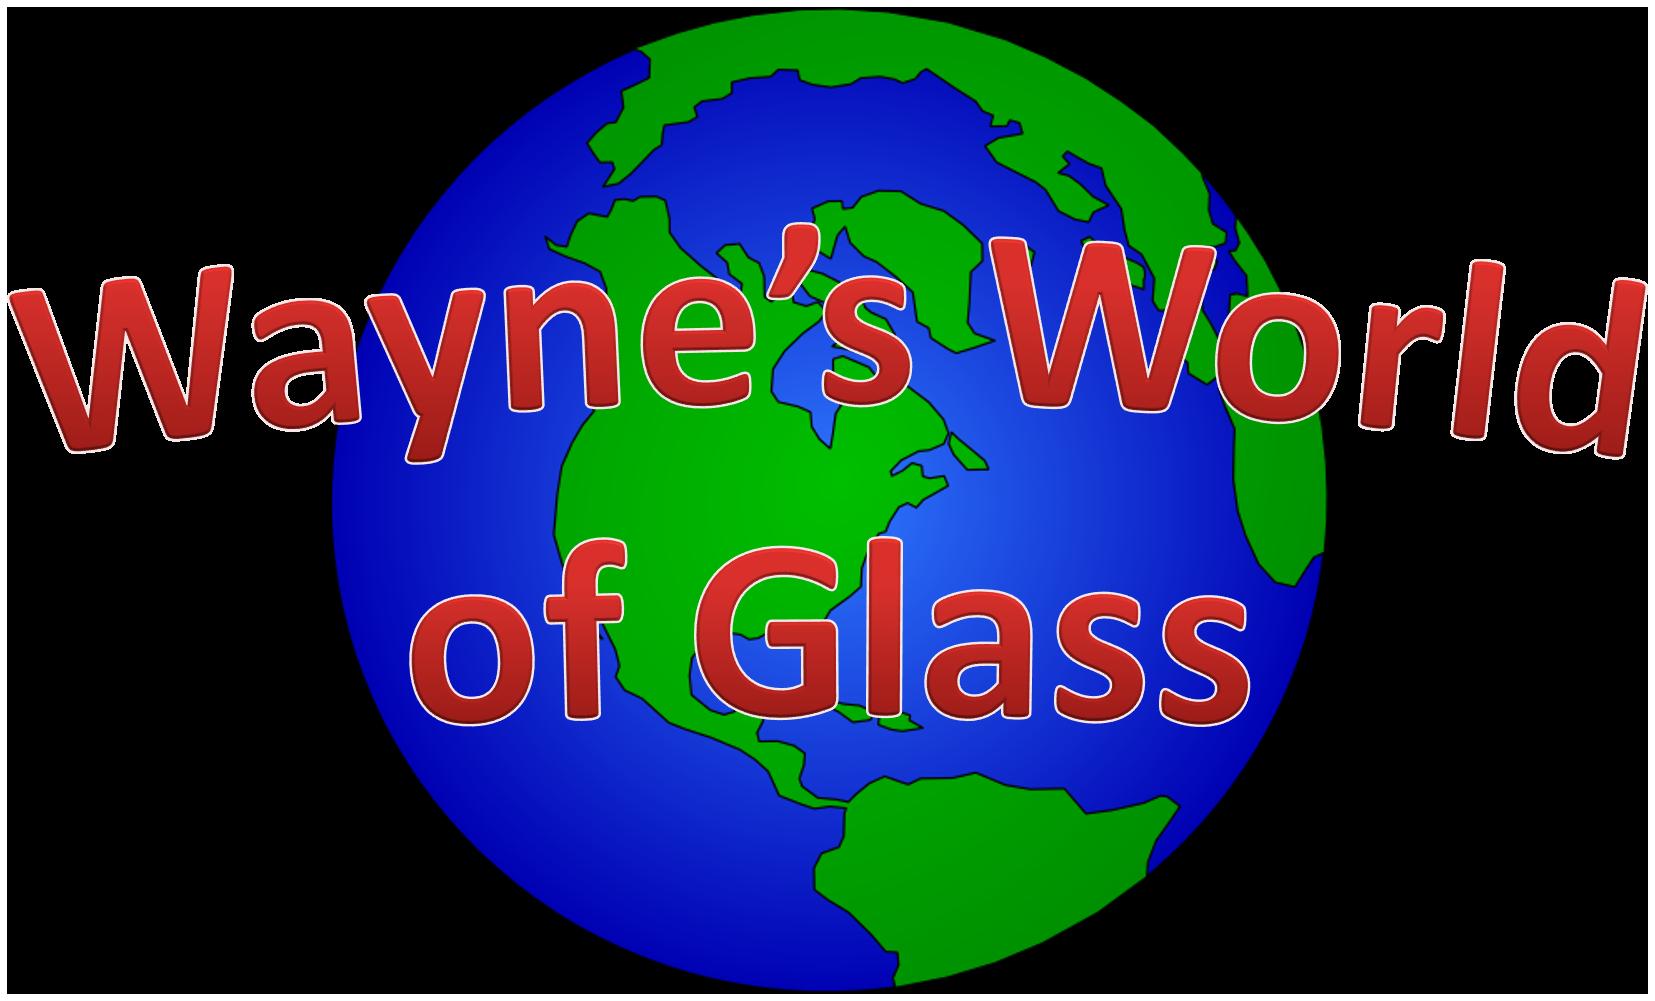 Wayne's World of Glass logo